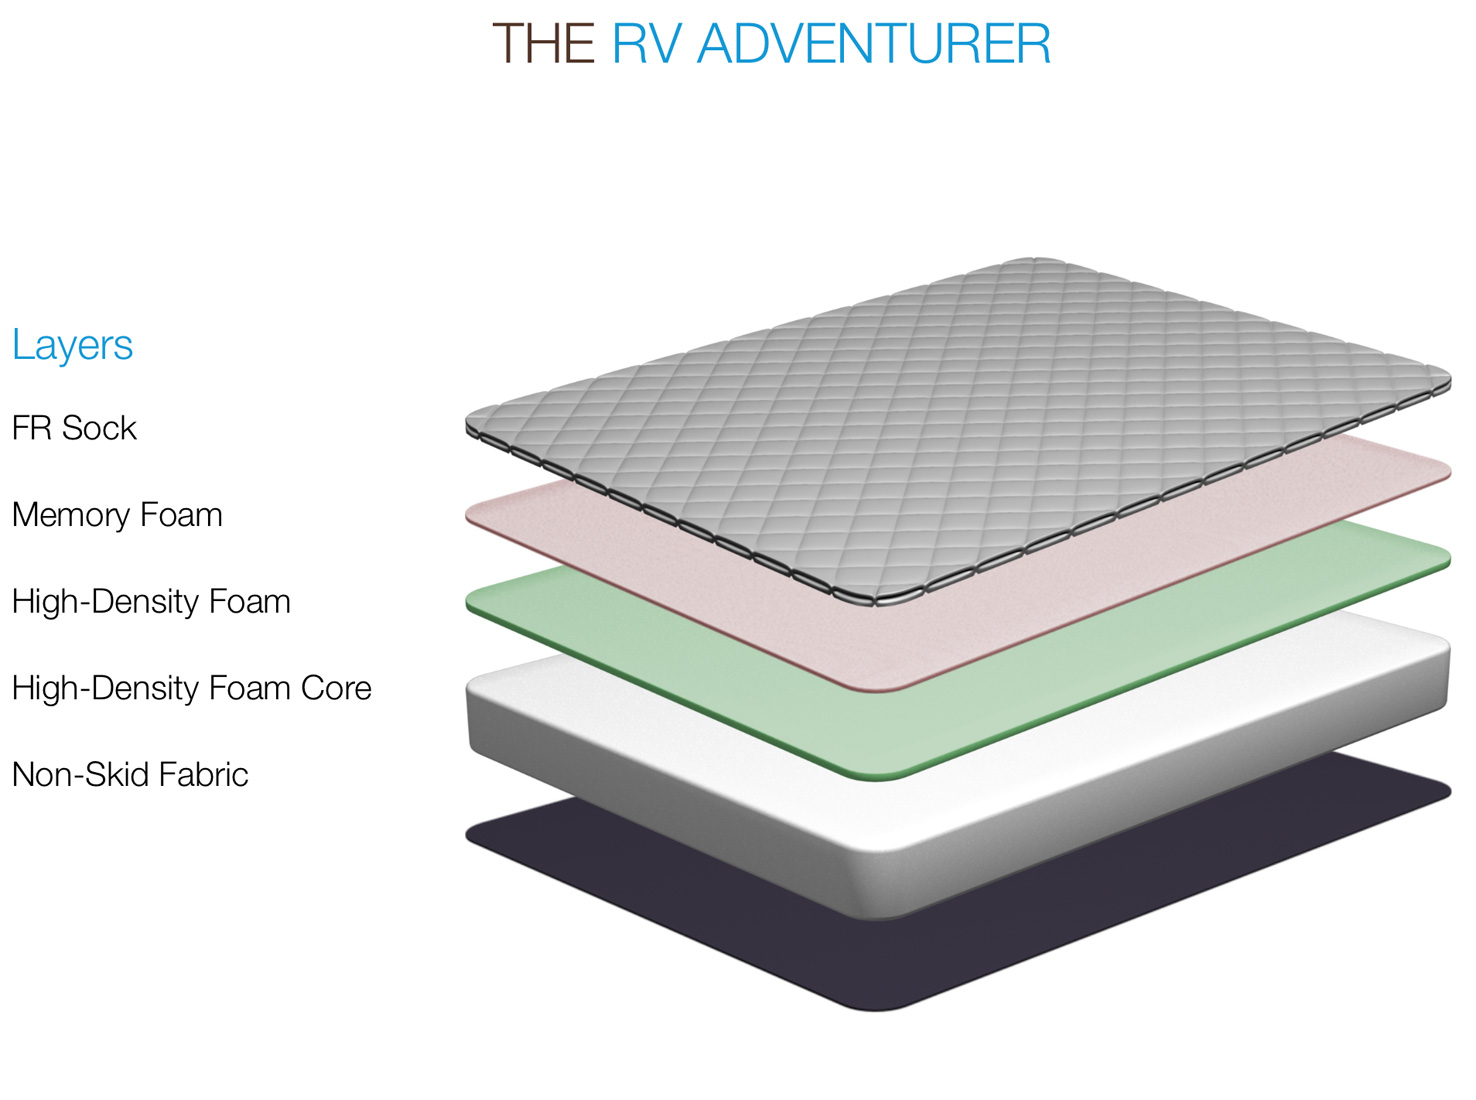 Parklane RV - The Adventurer Memory Foam RV Mattress